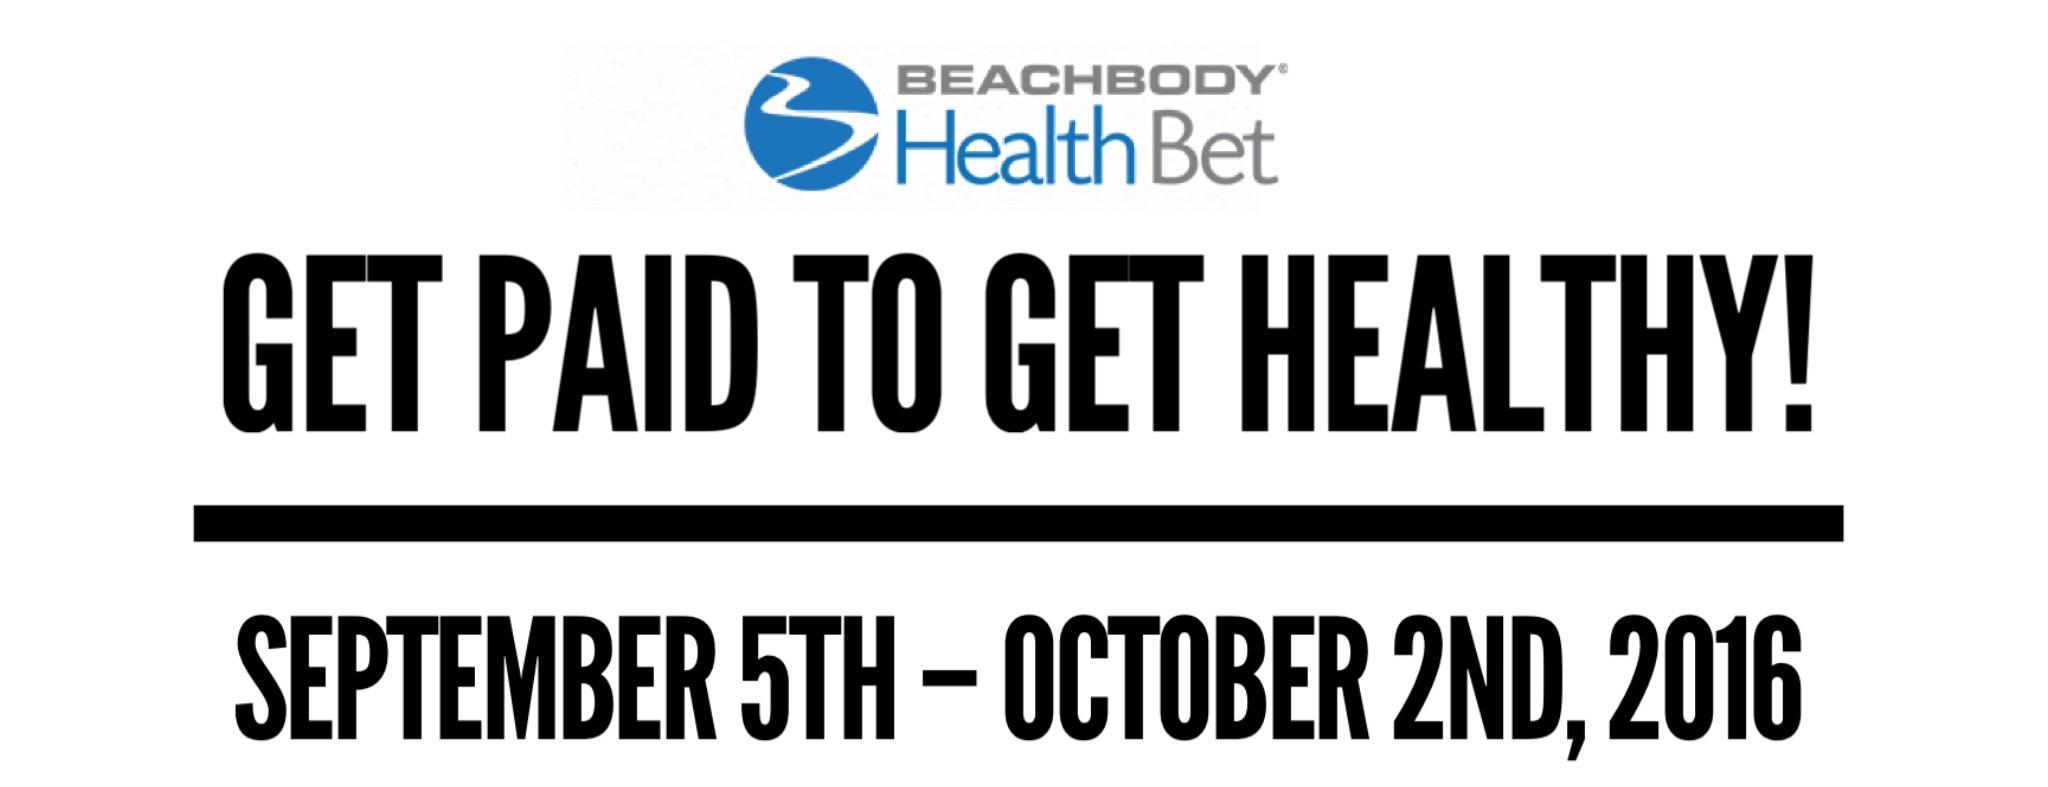 Beachbody Health Bet